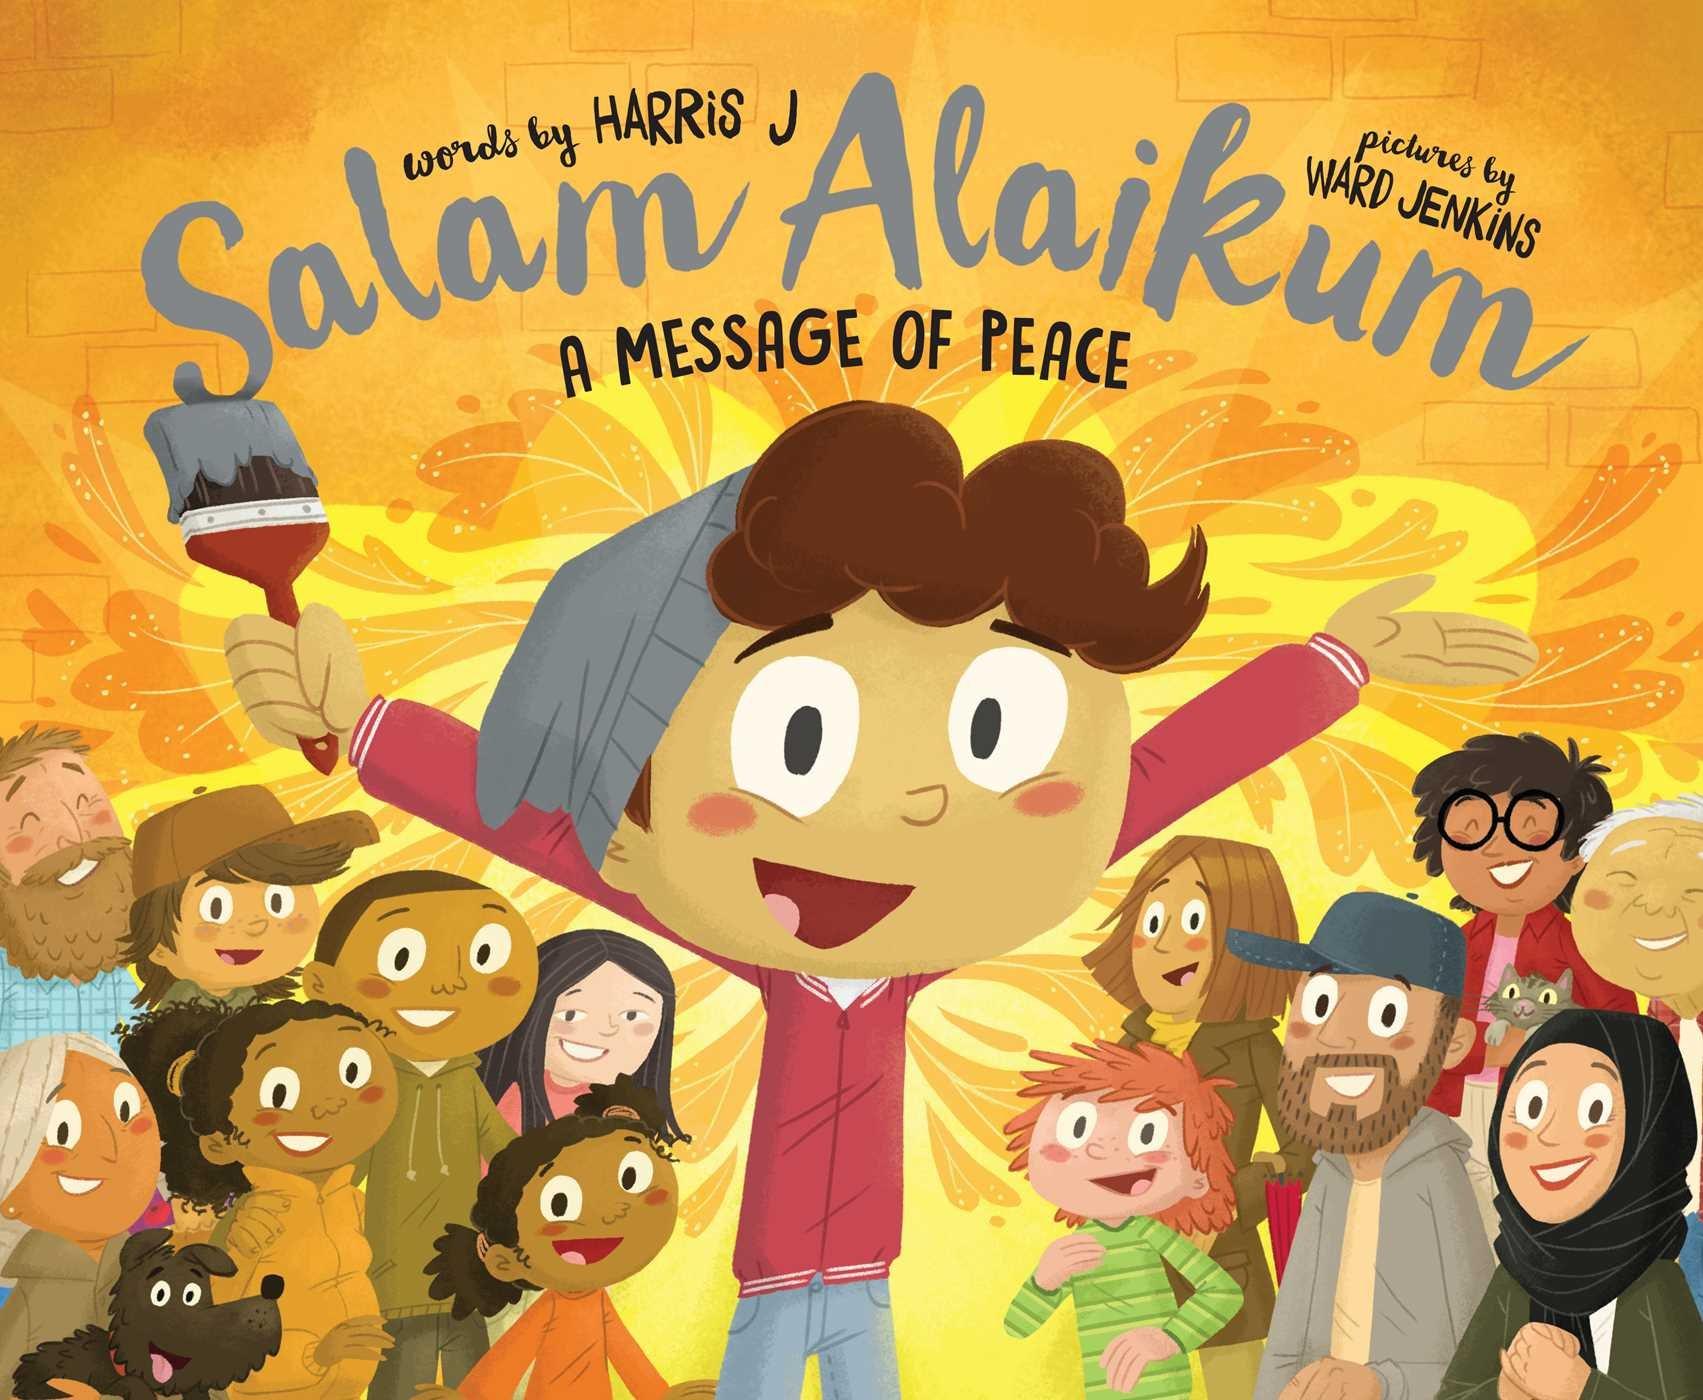 Salam Alaikum A Message Of Peace.jpg